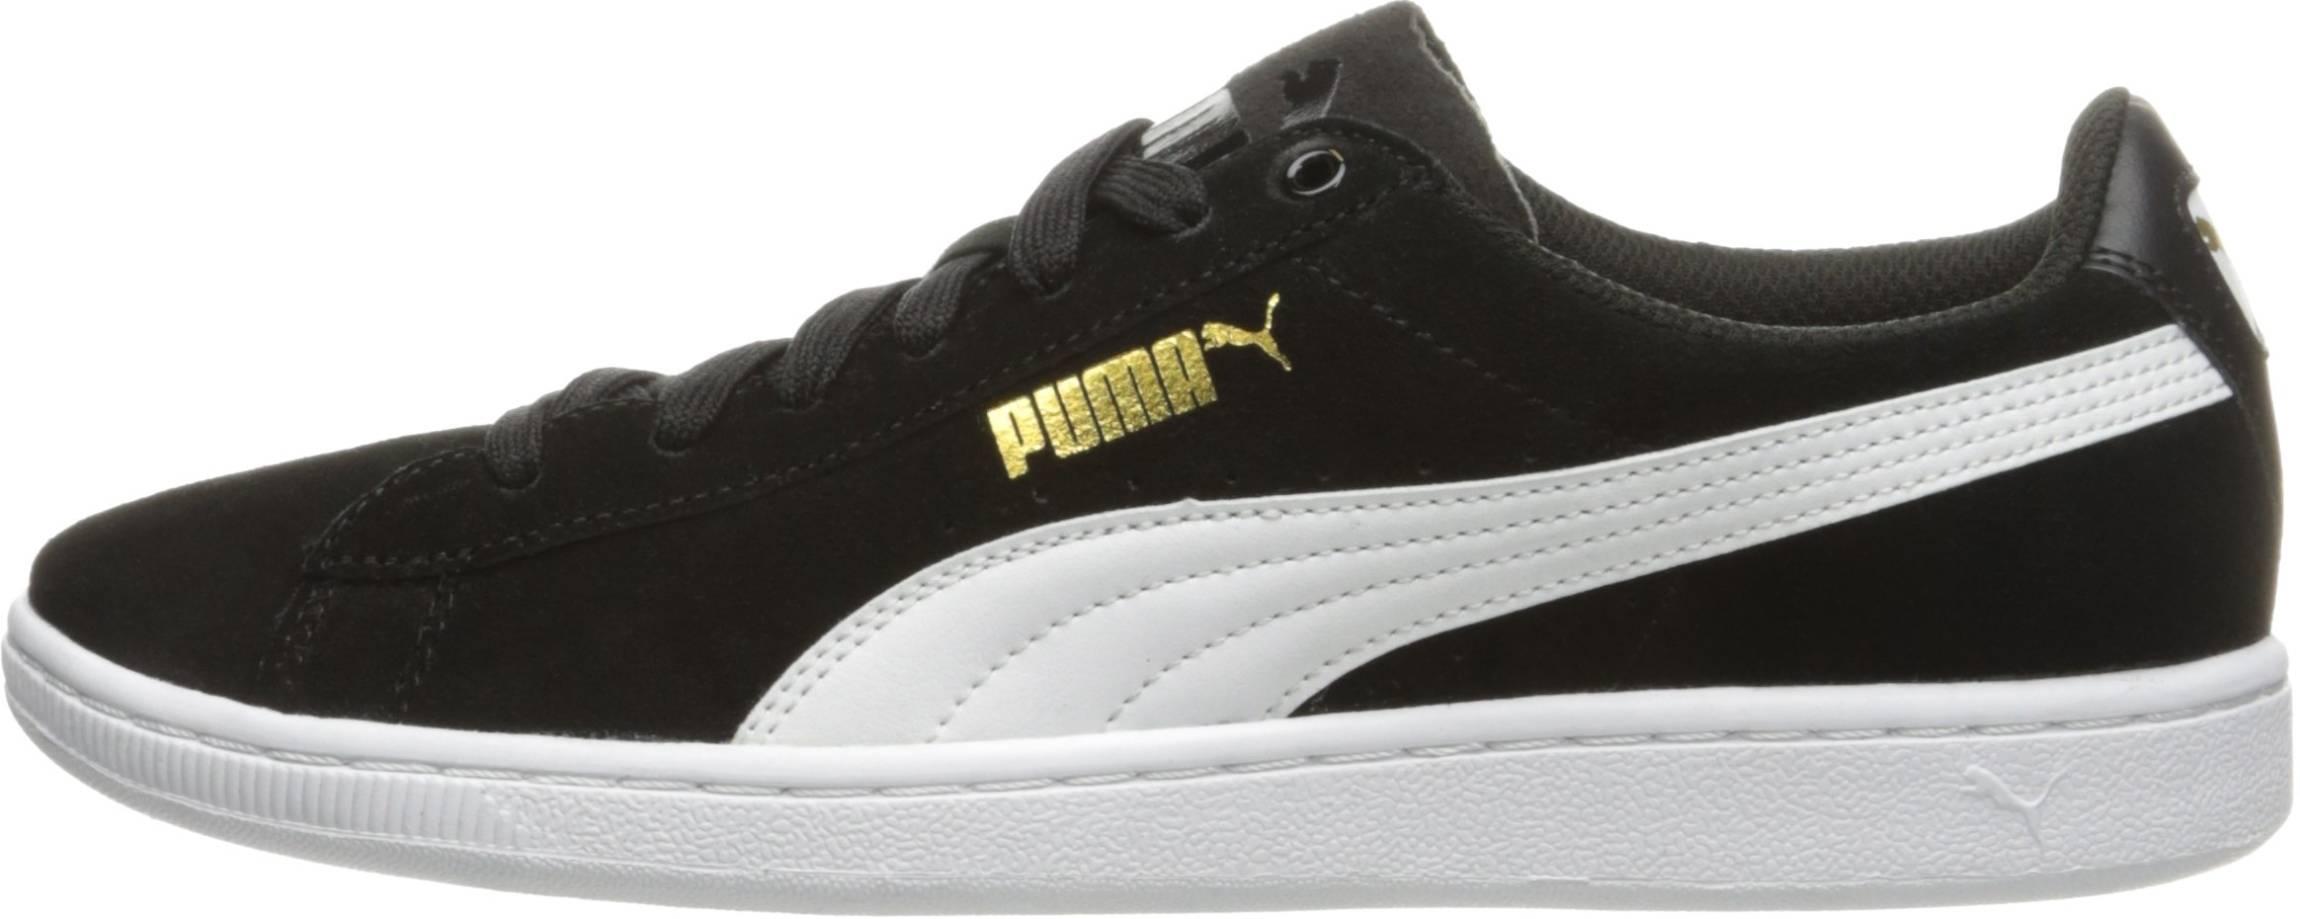 $55 + Review of Puma Vikky SoftFoam